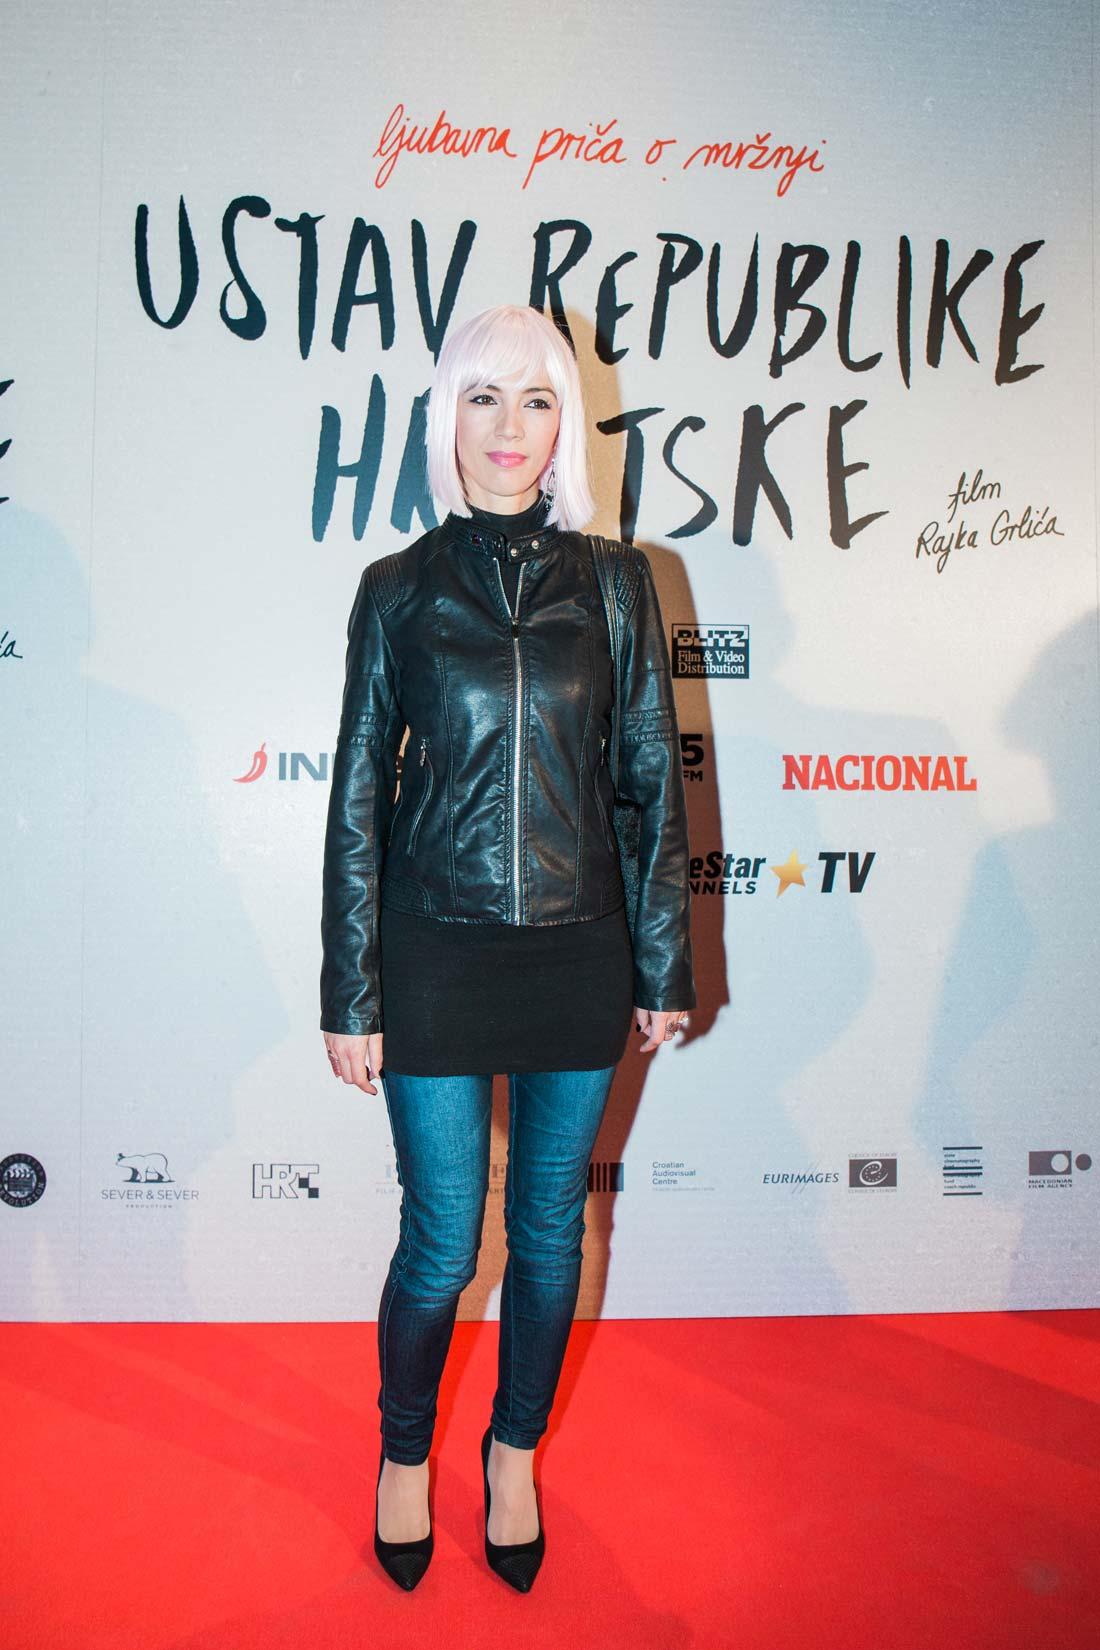 Ana Majhenić ustav-republike-hrvatske-ana-majhenic – journal.hr